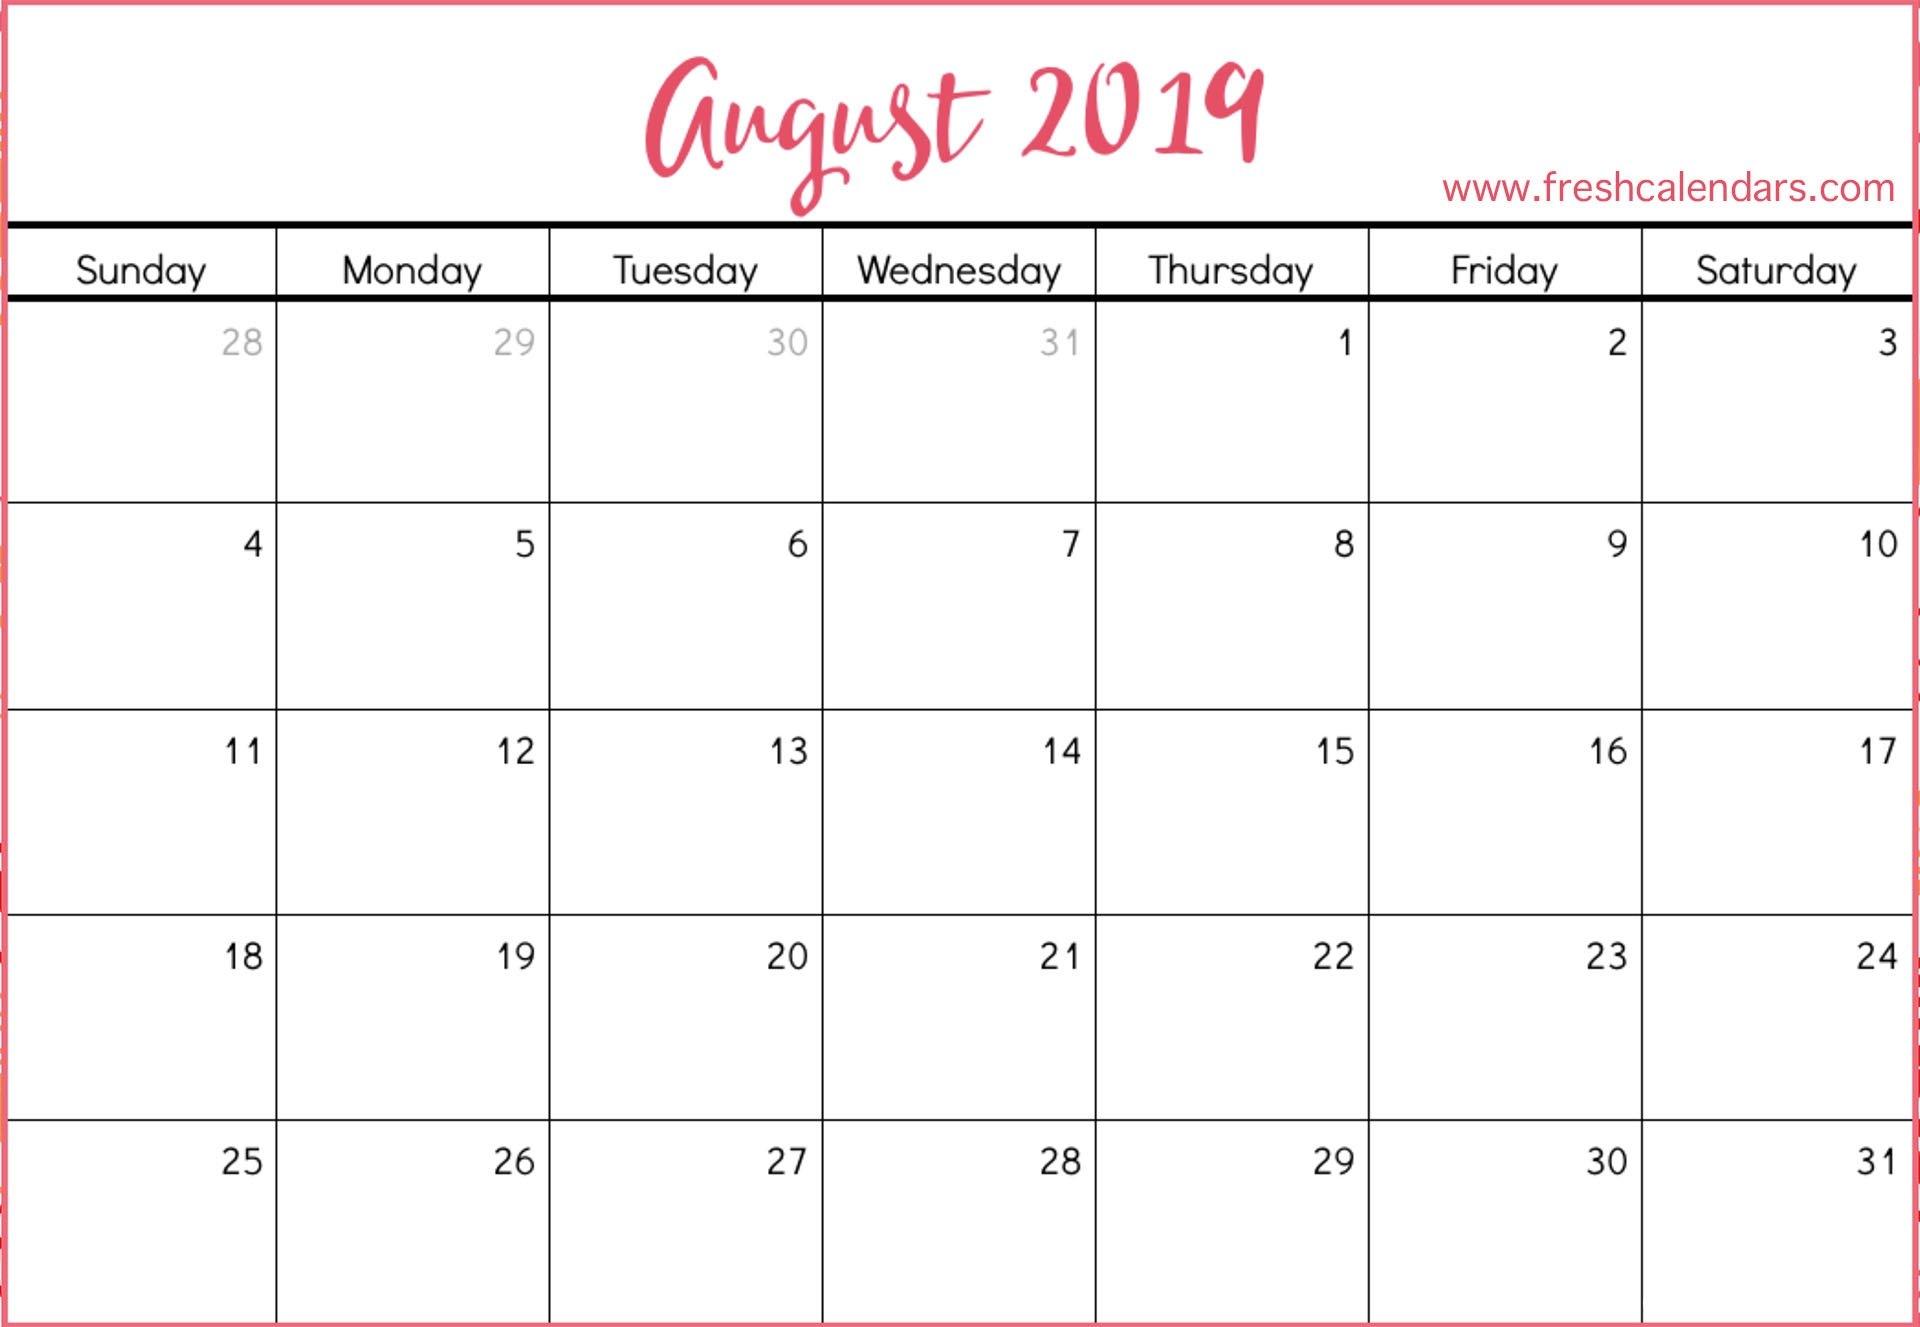 August 2019 Printable Calendars - Fresh Calendars Calendar Of 2019 August